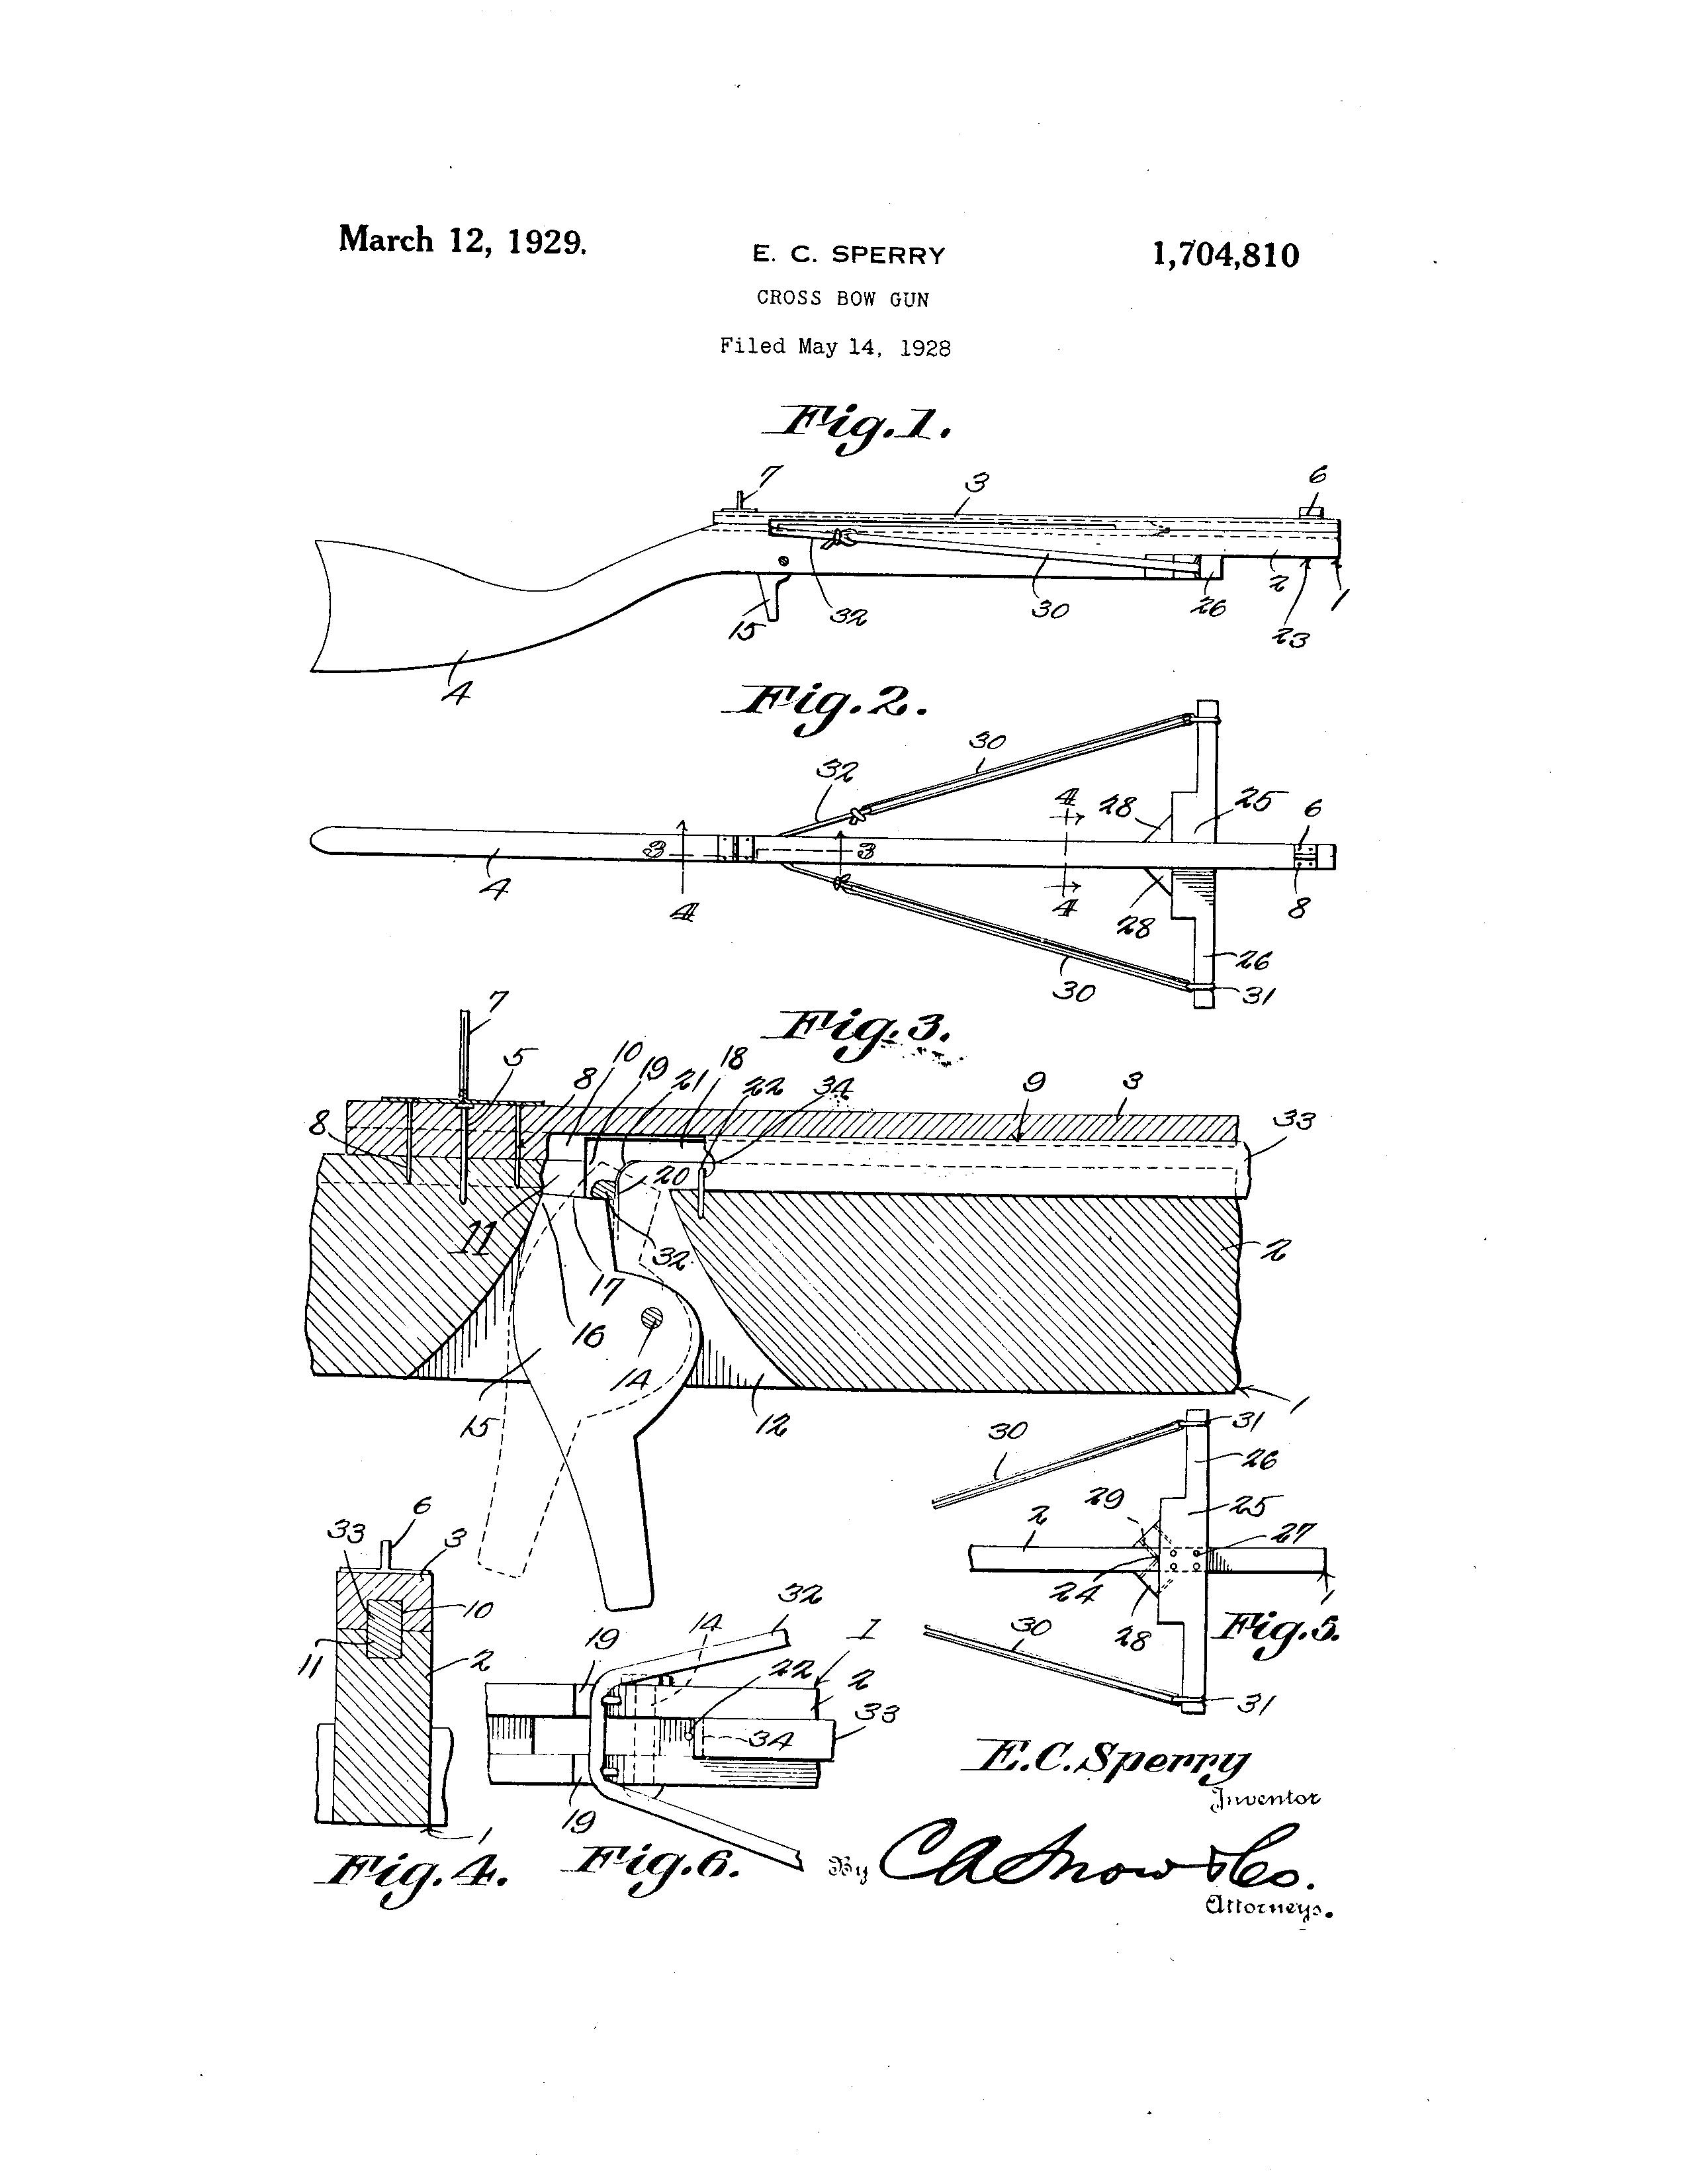 More interesting patents - Slingshot Crossbows